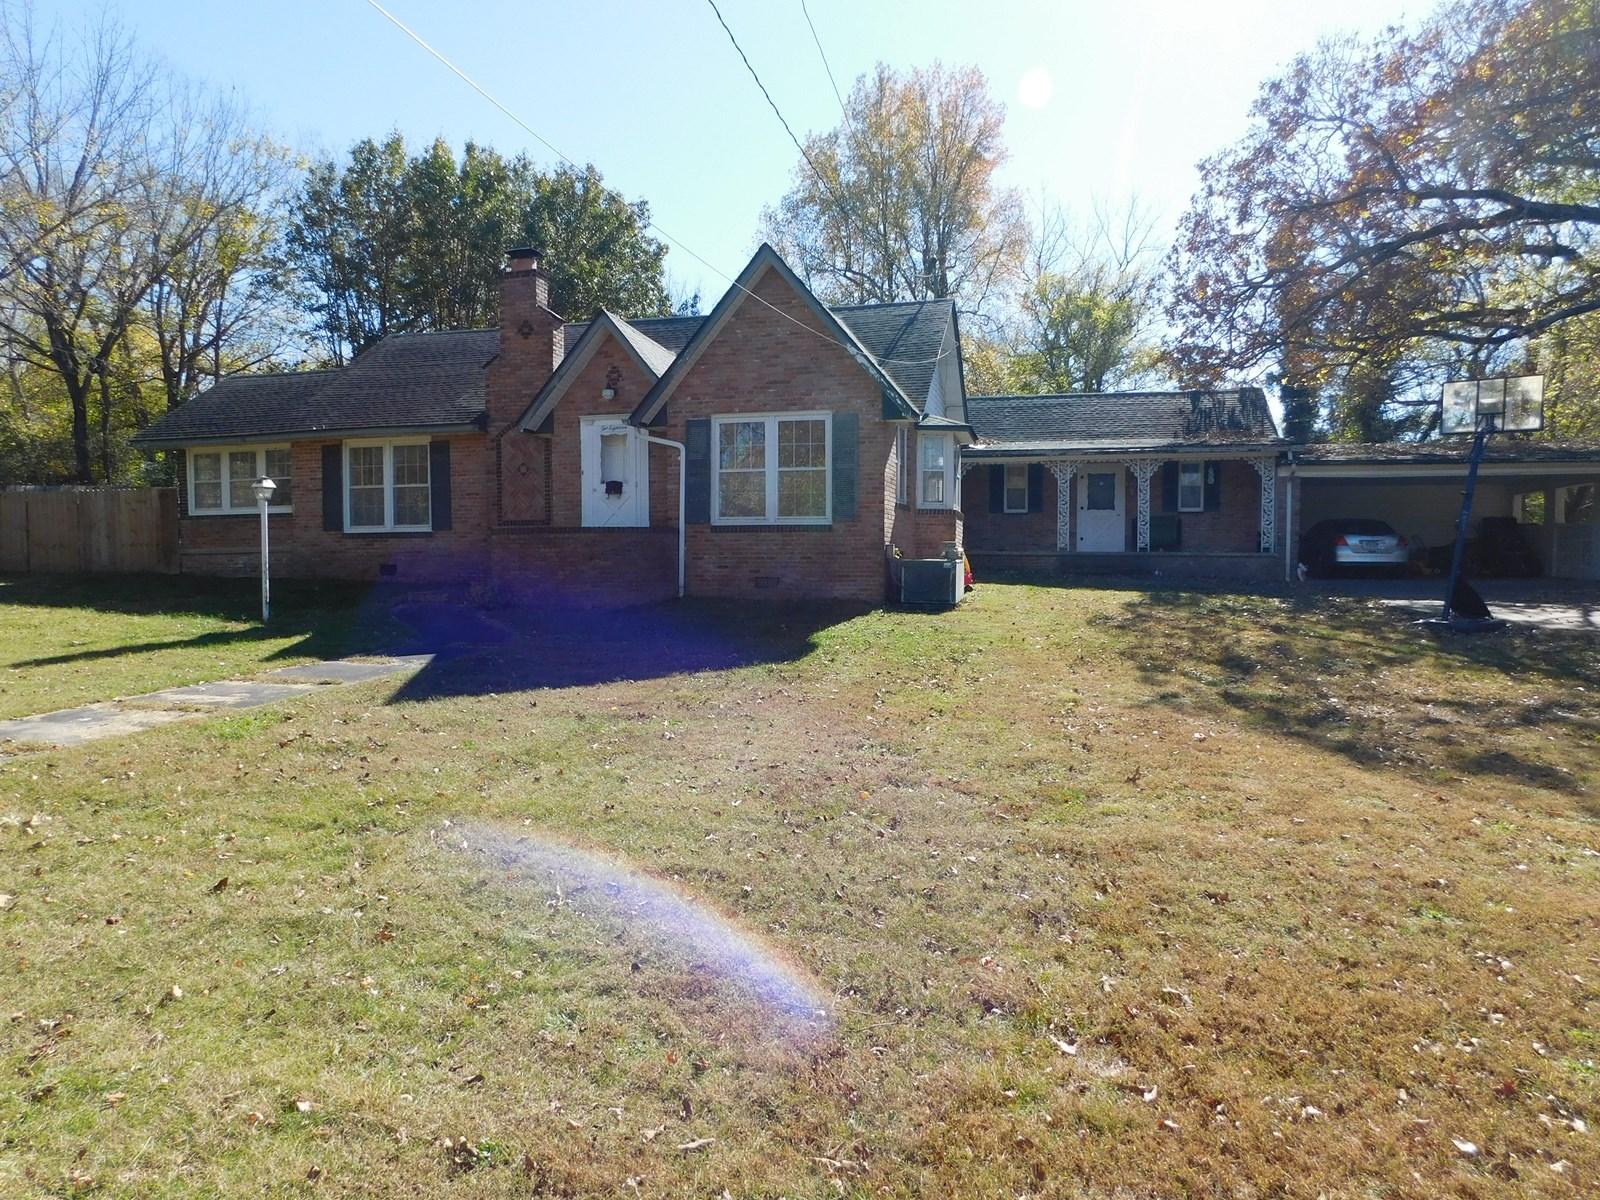 Home For Sale in Harrison, Arkansas